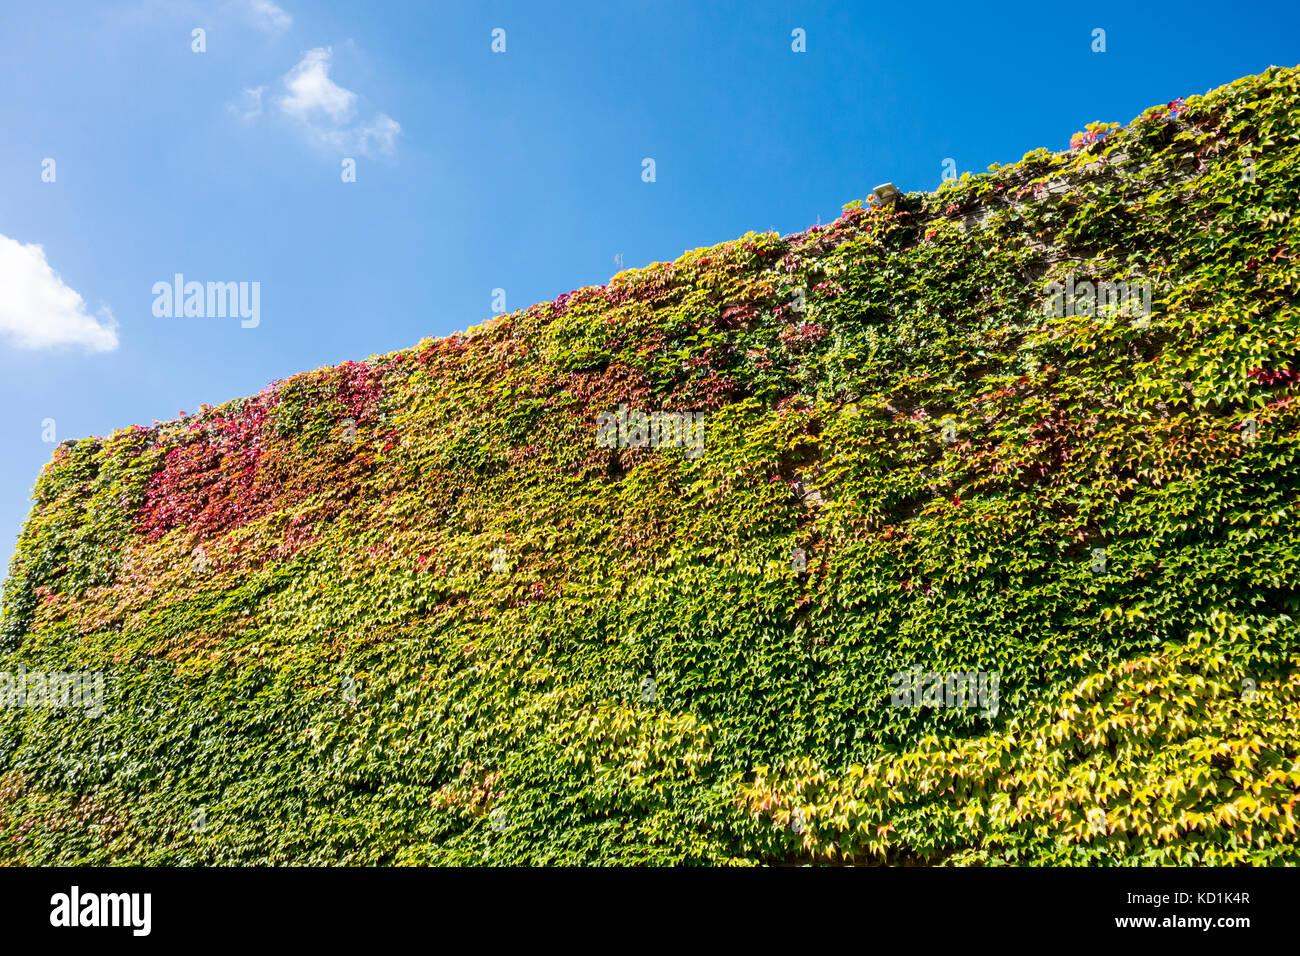 Boston Ivy (parthenocissus tricuspidata) covered building, Churchill College, University of Cambridge, UK - Stock Image